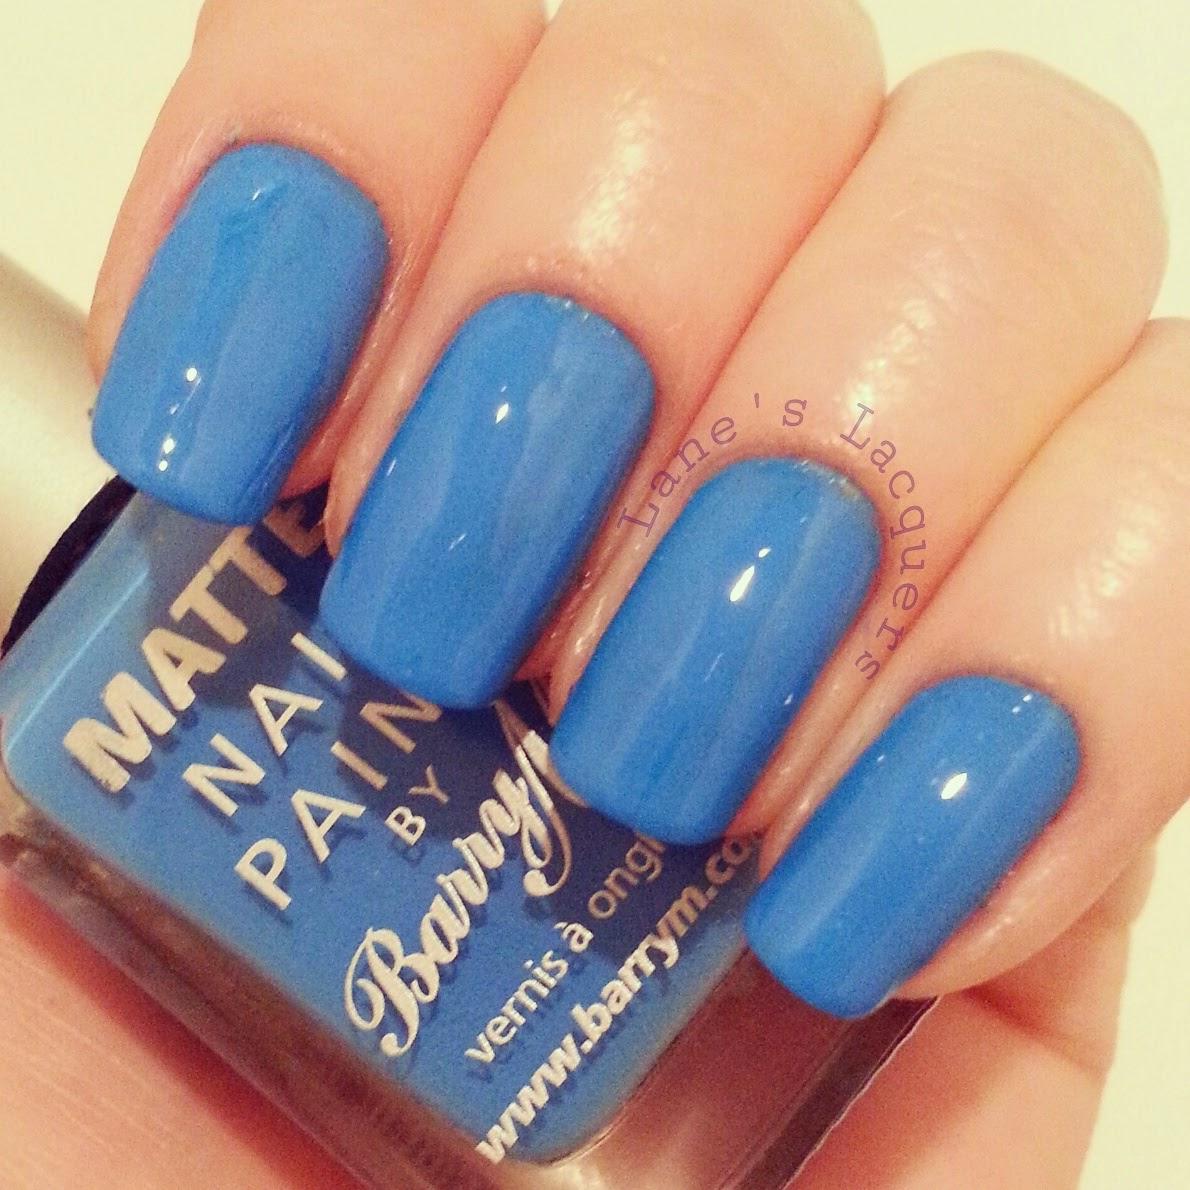 barry-m-malibu-swatch-manicure (3)